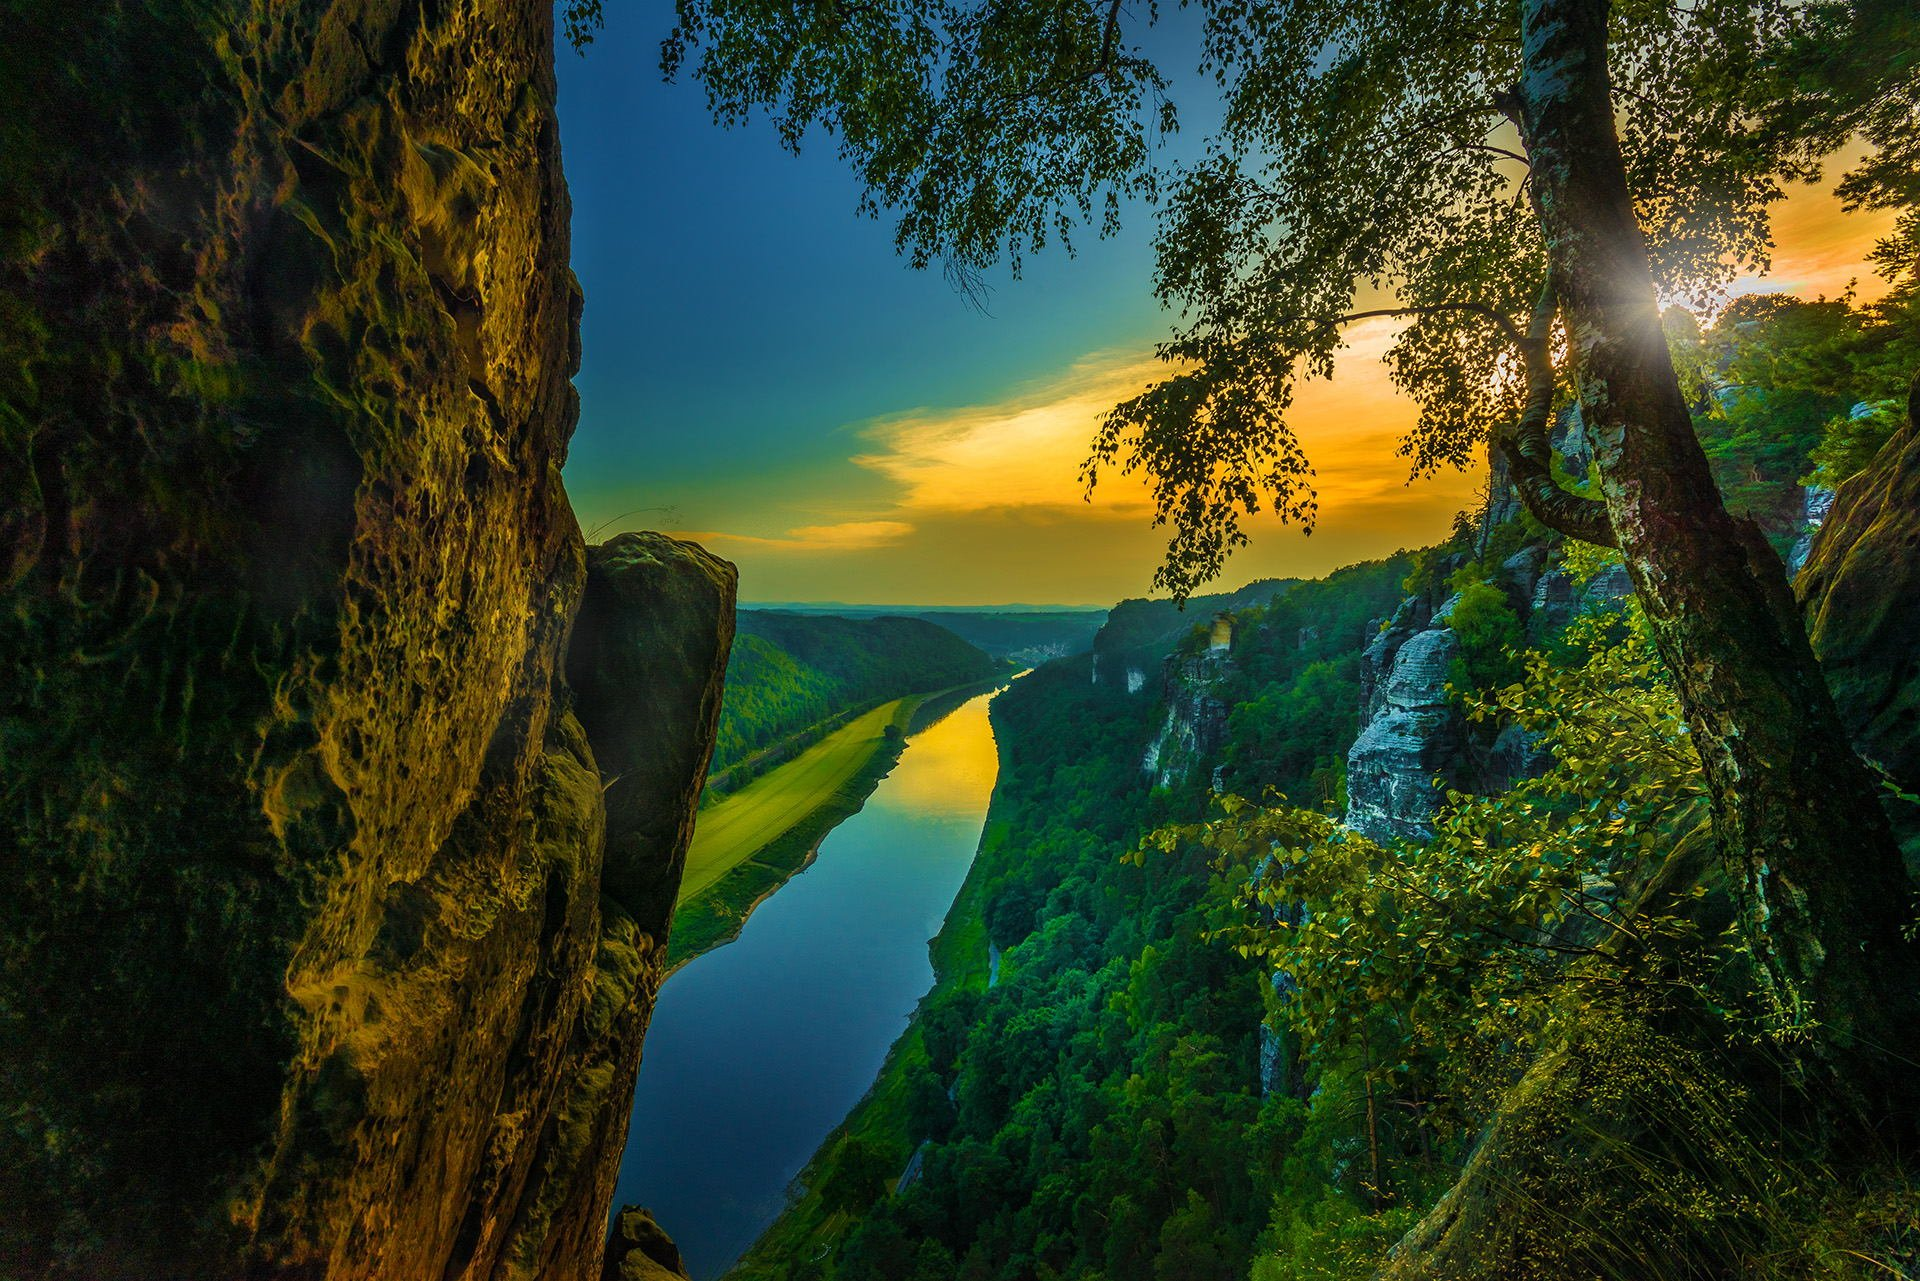 Landscape hd wallpaper background image 1920x1281 id - Nature wallpaper 2560x1600 ...